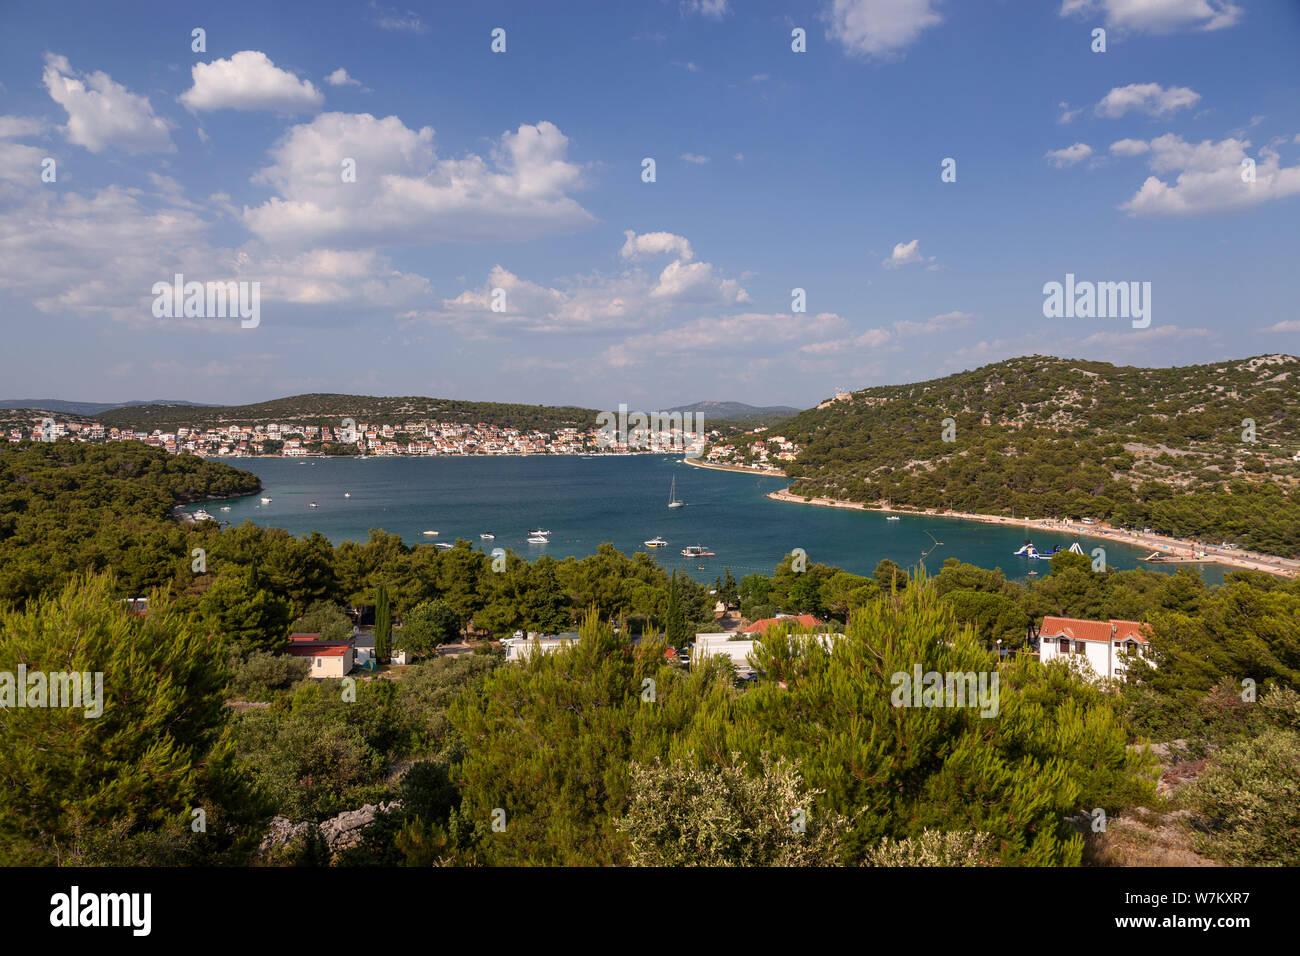 Tisno on the Adriatic coast of Croatia Stock Photo